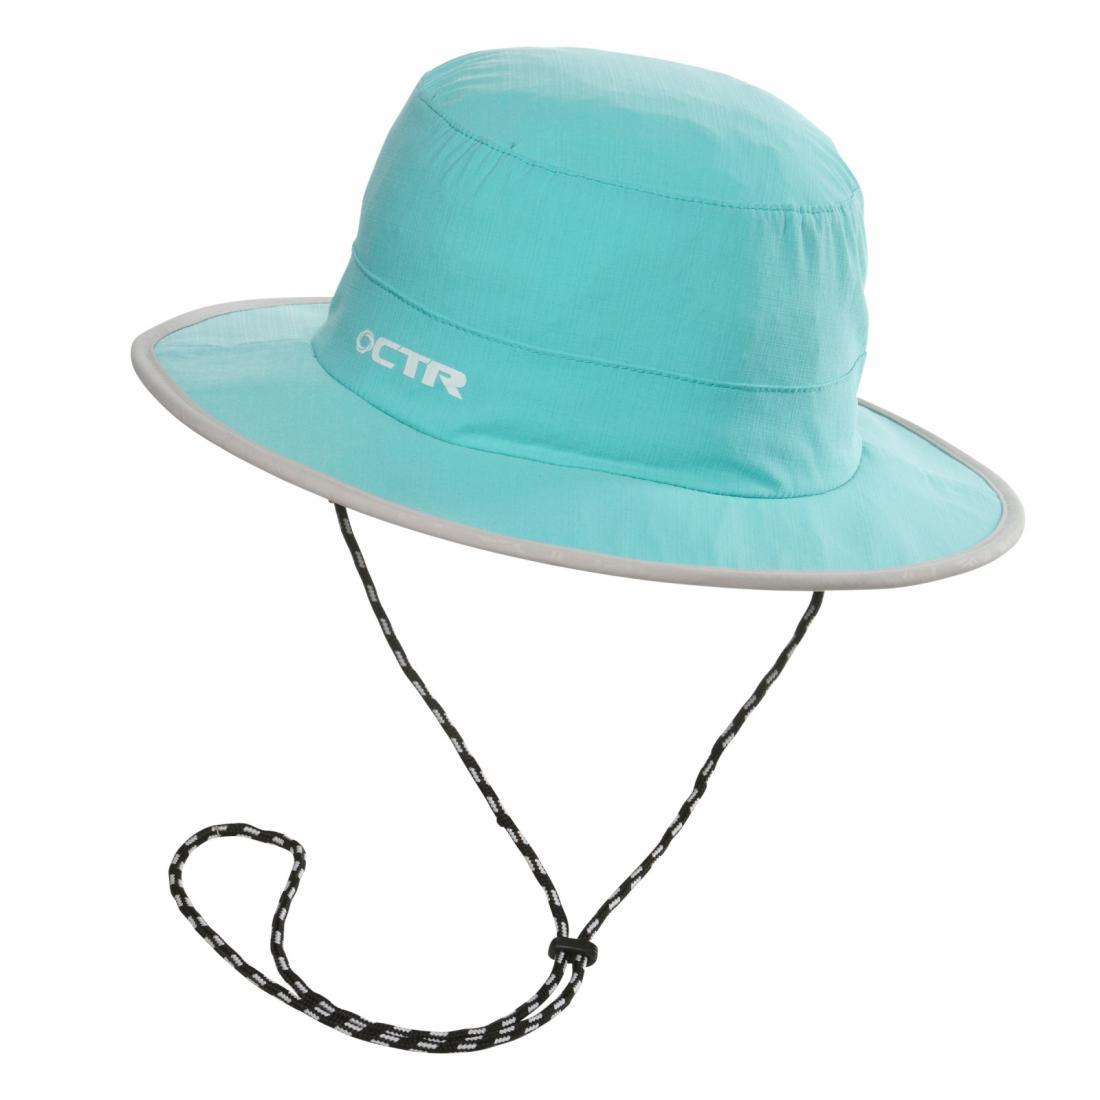 Chaos Панама Summit Day Hat жен. (S-M, 534, ,) petzl summit 66cm